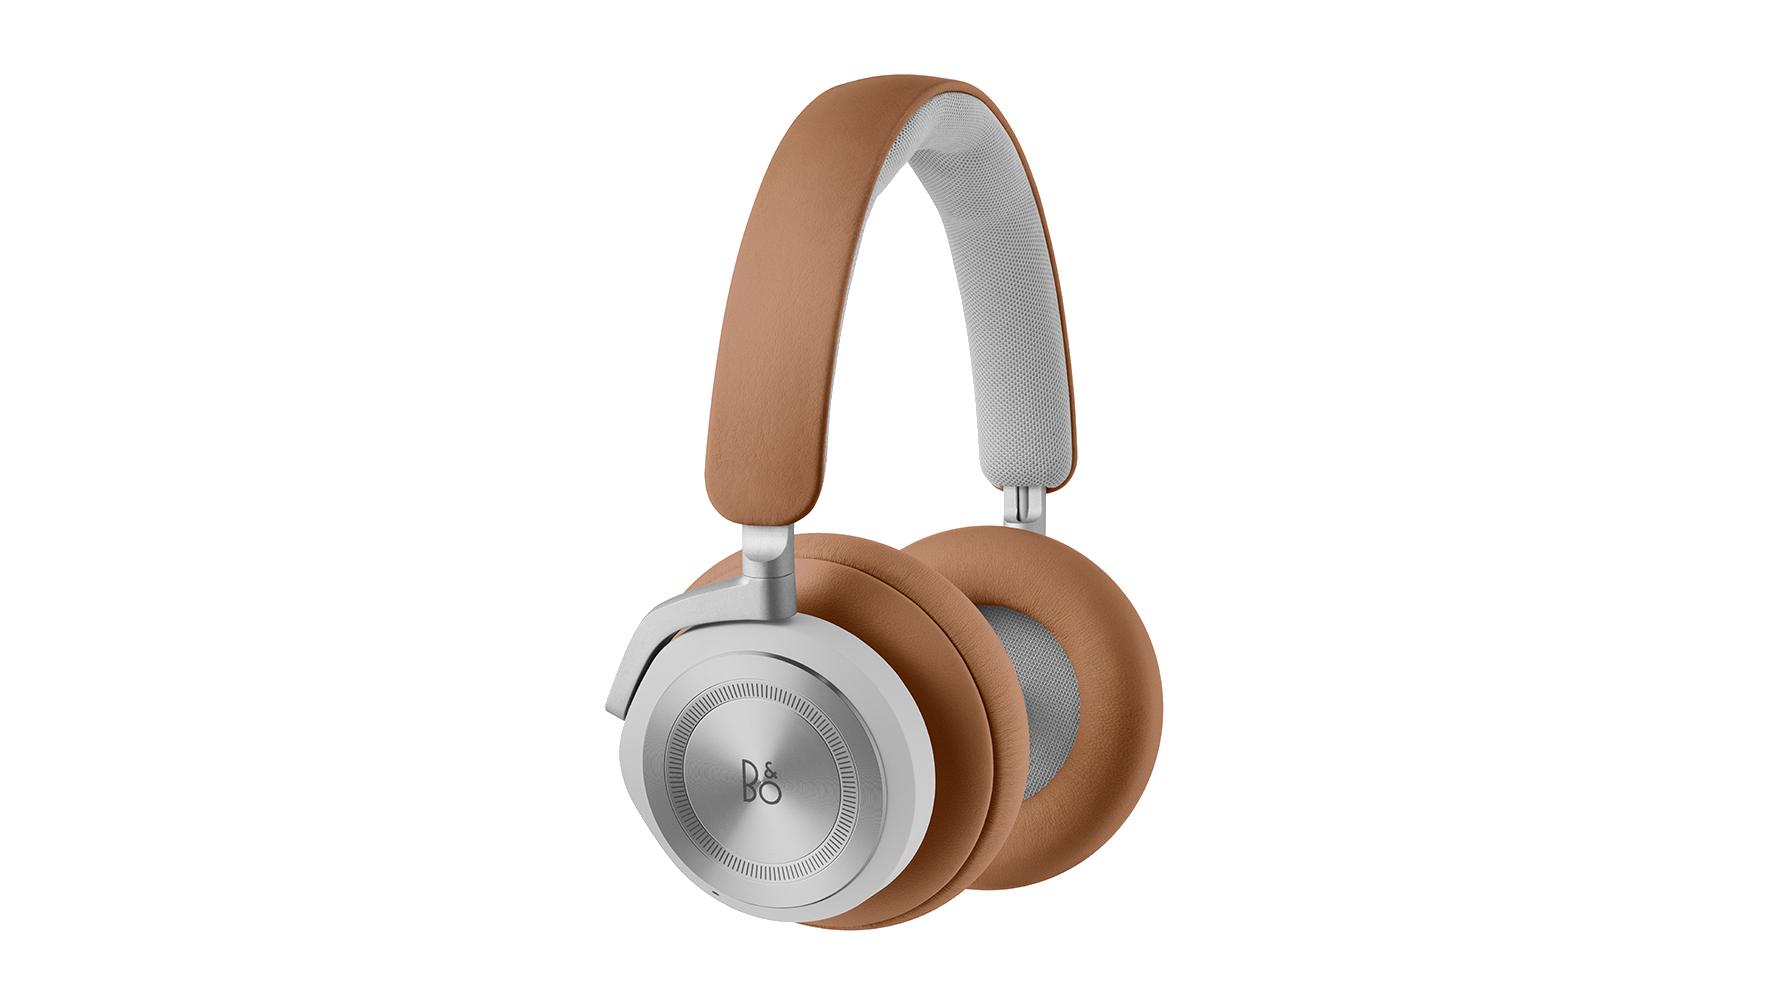 The Bang & Olufsen Beoplay HX headphones